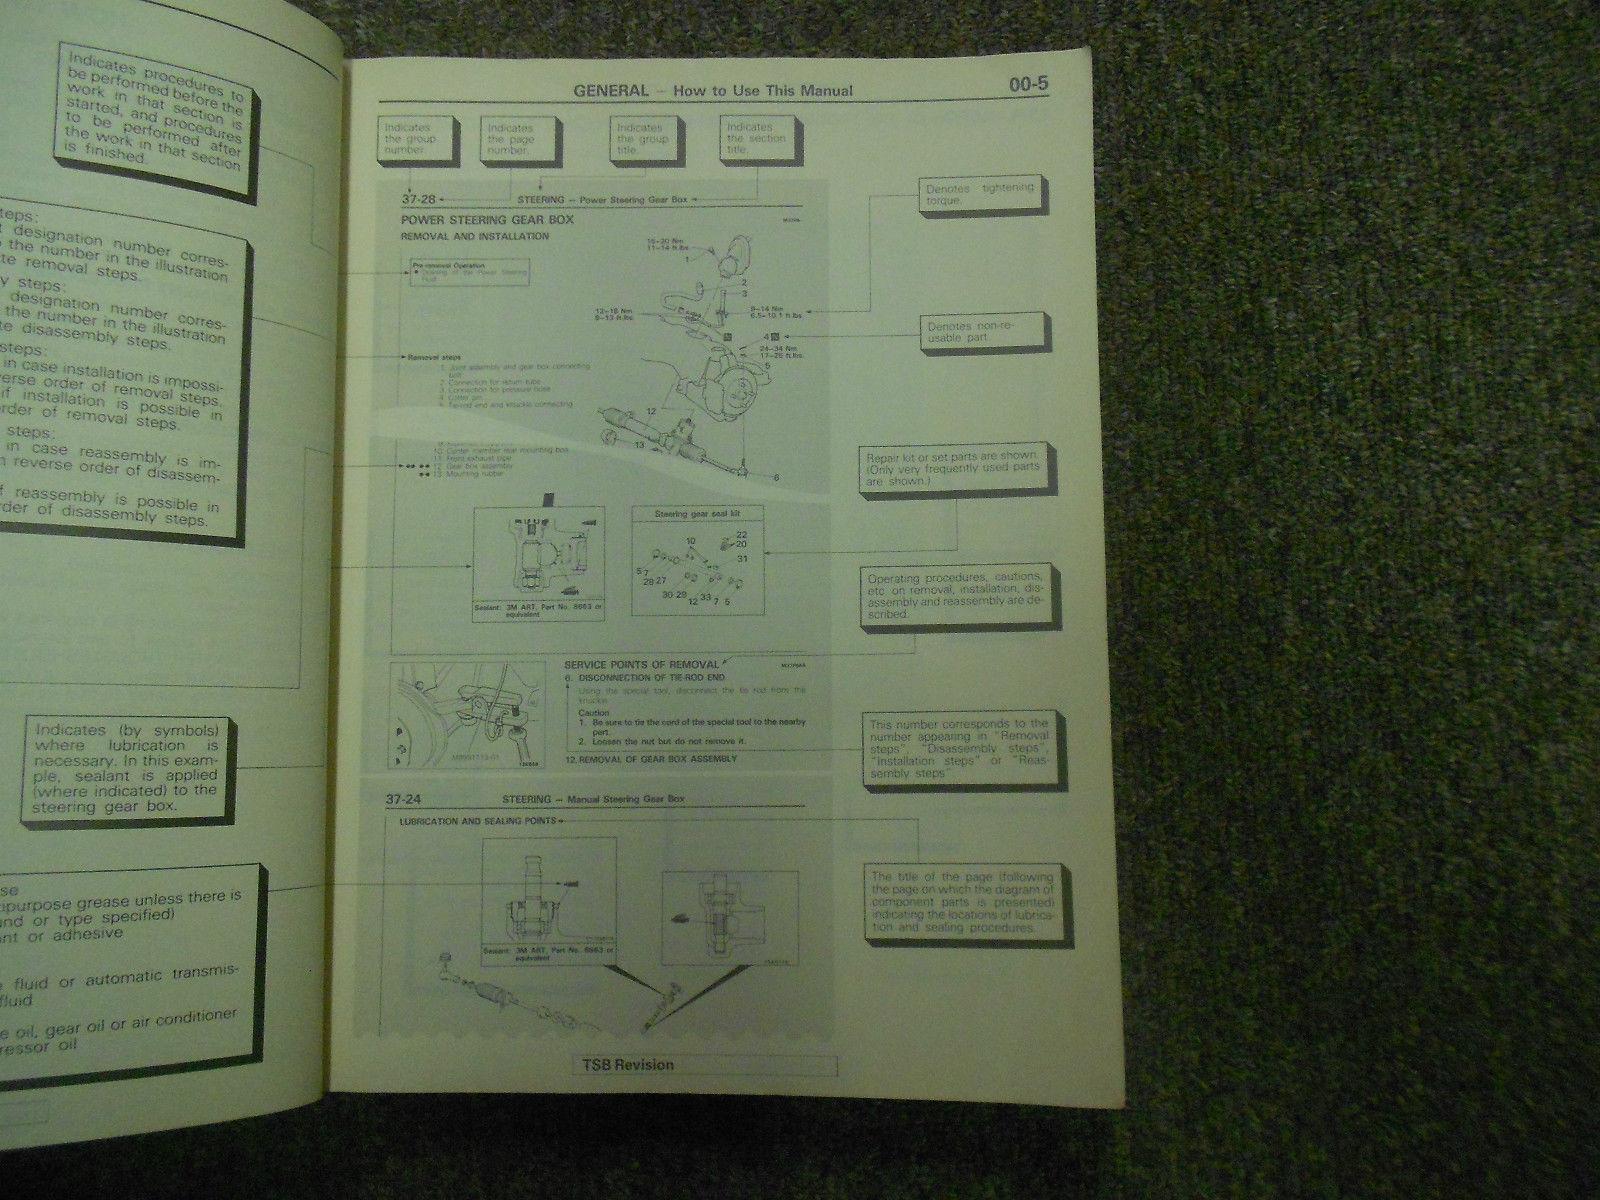 1990 MITSUBISHI Van Wagon Service Shop Manual Volume 1 Engine Chassis Body OEM